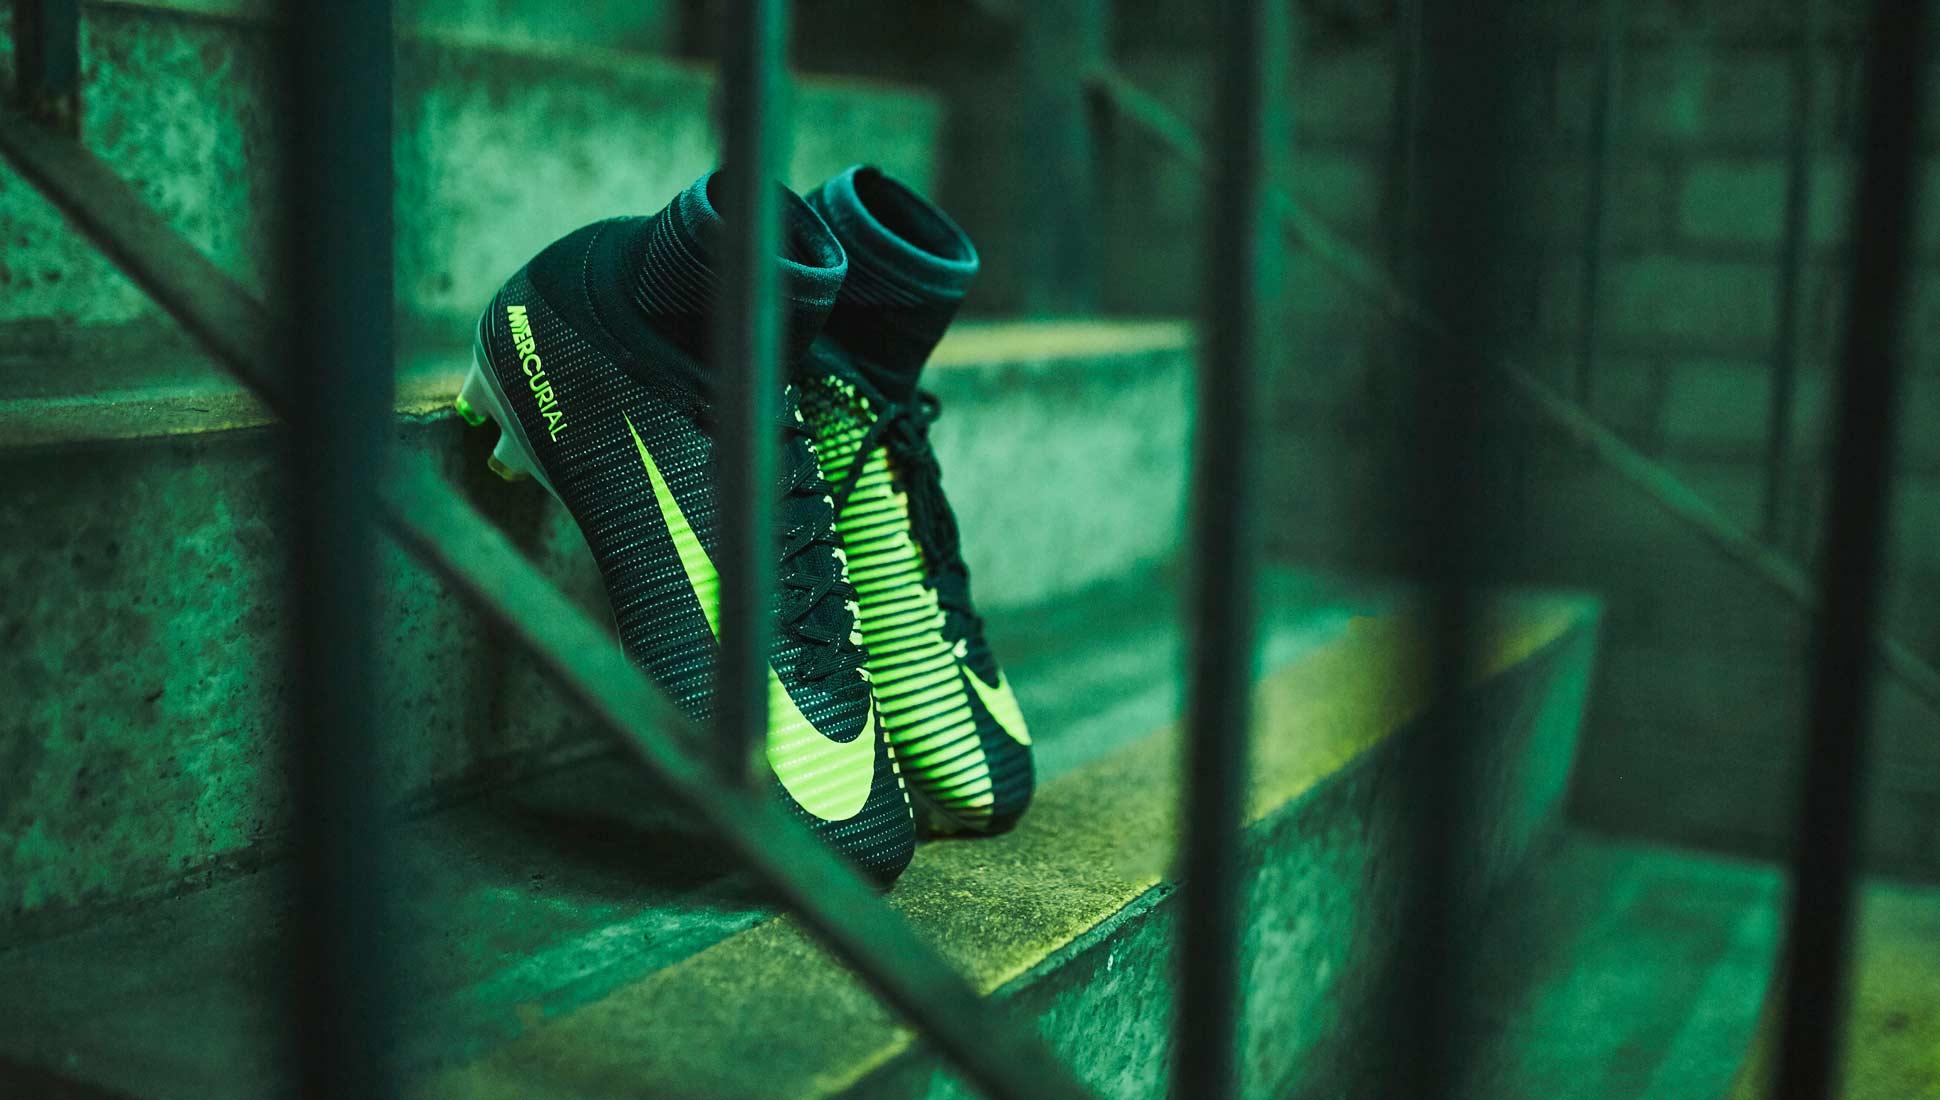 Giày đá banh Nike Mercurial Superfly V CR7 Chapter 3: 'Discovery'